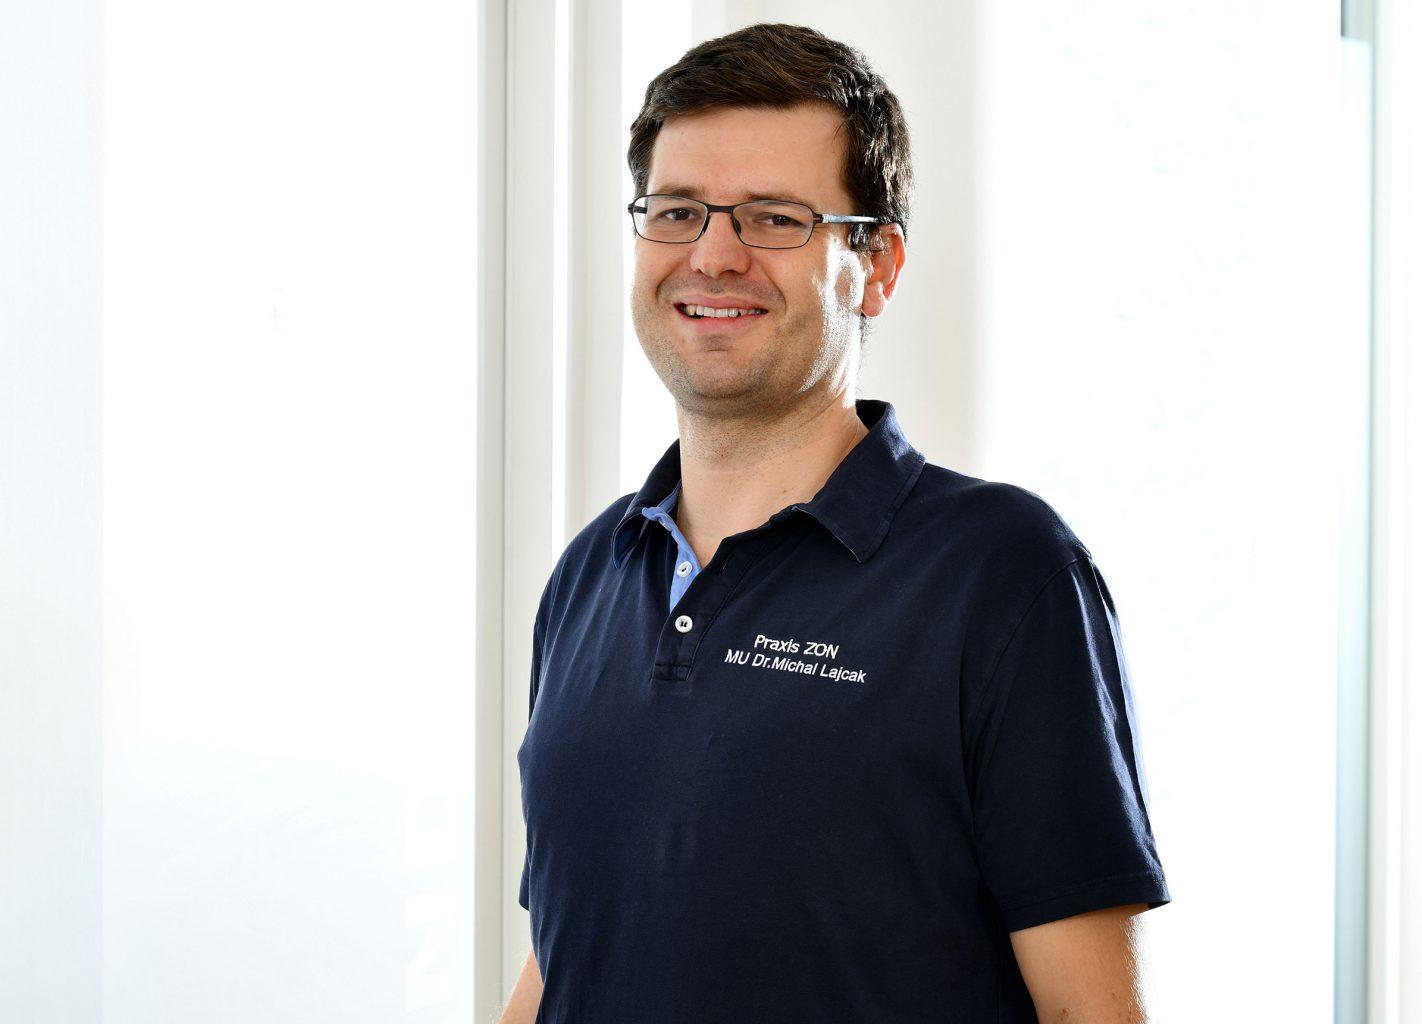 MU Dr. Michal Lajcak Neurochirurgie